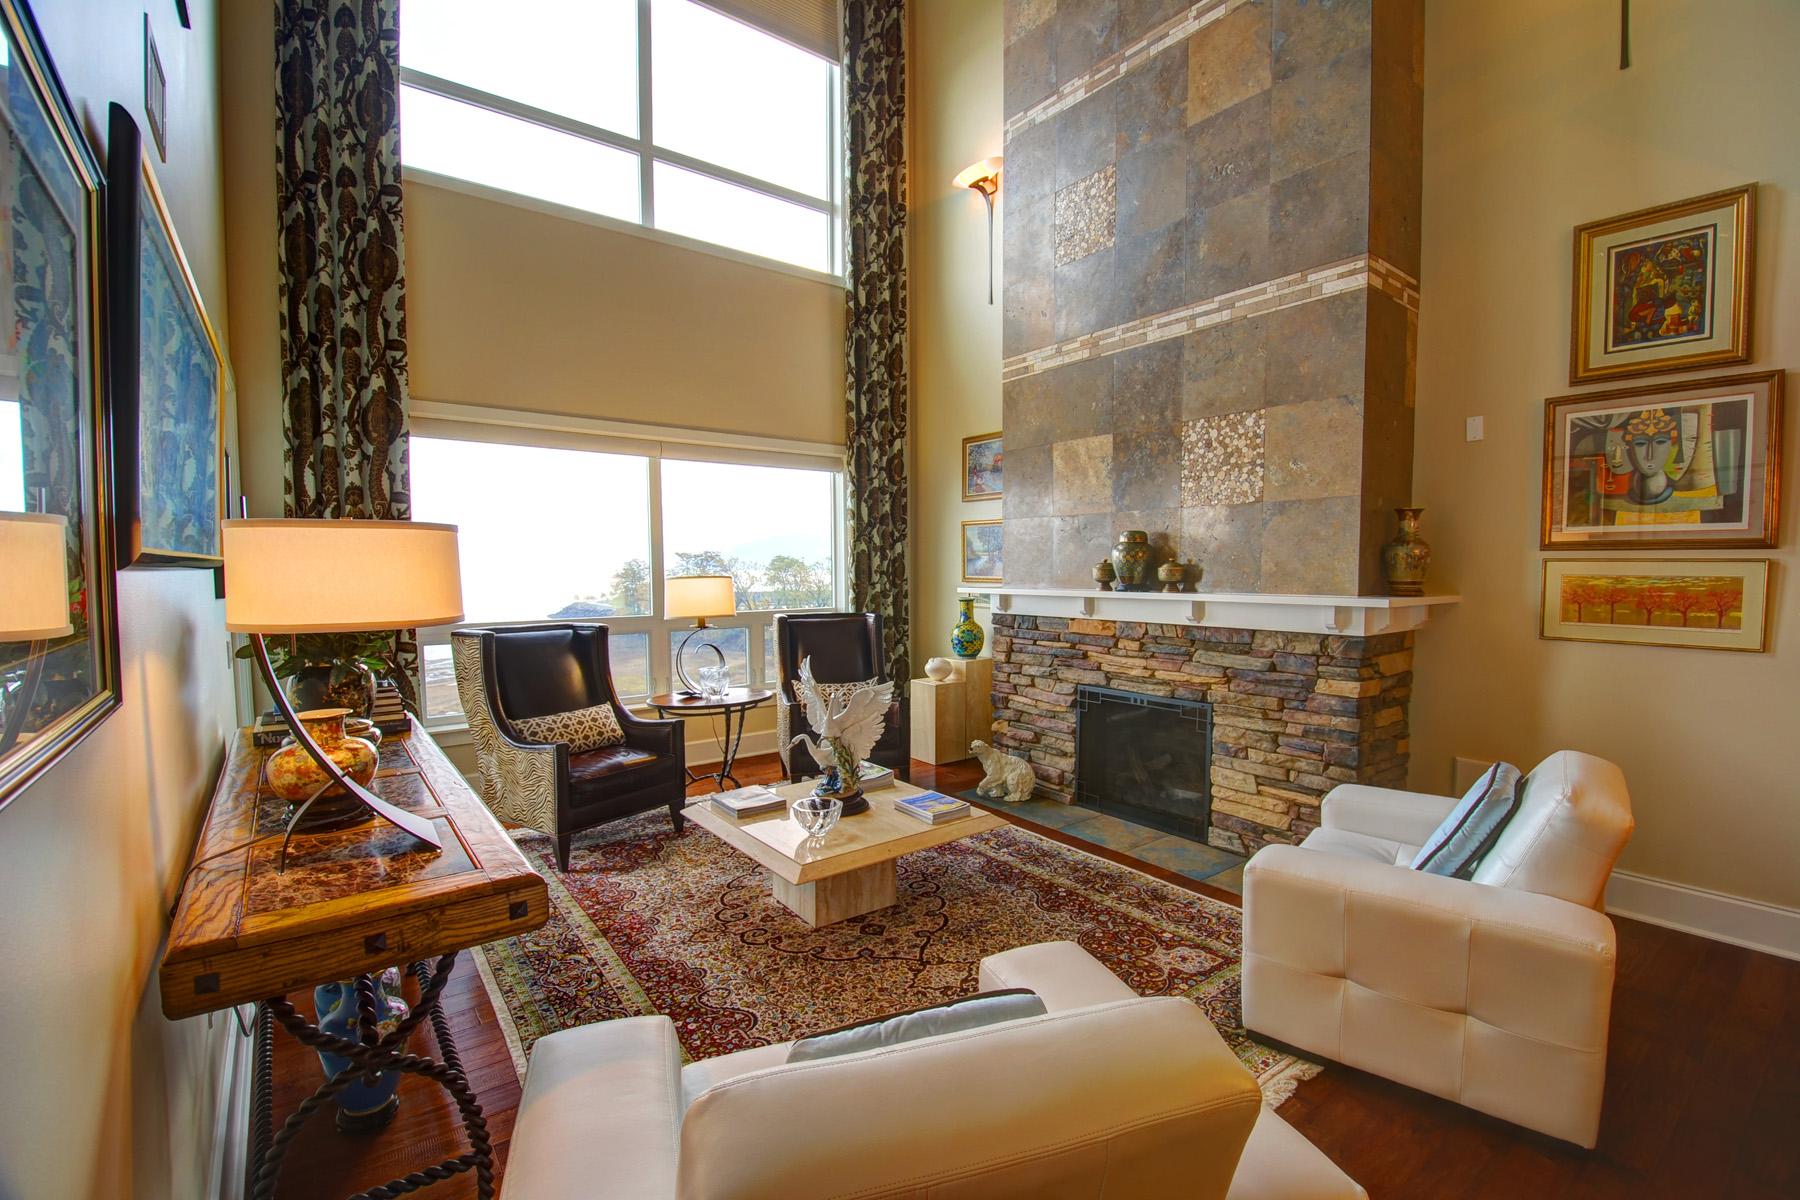 Condominium for Sale at Elegant Lake Pend Oreille Penthouse Loft 402 Sandpoint Ave #323 Sandpoint, Idaho 83864 United States